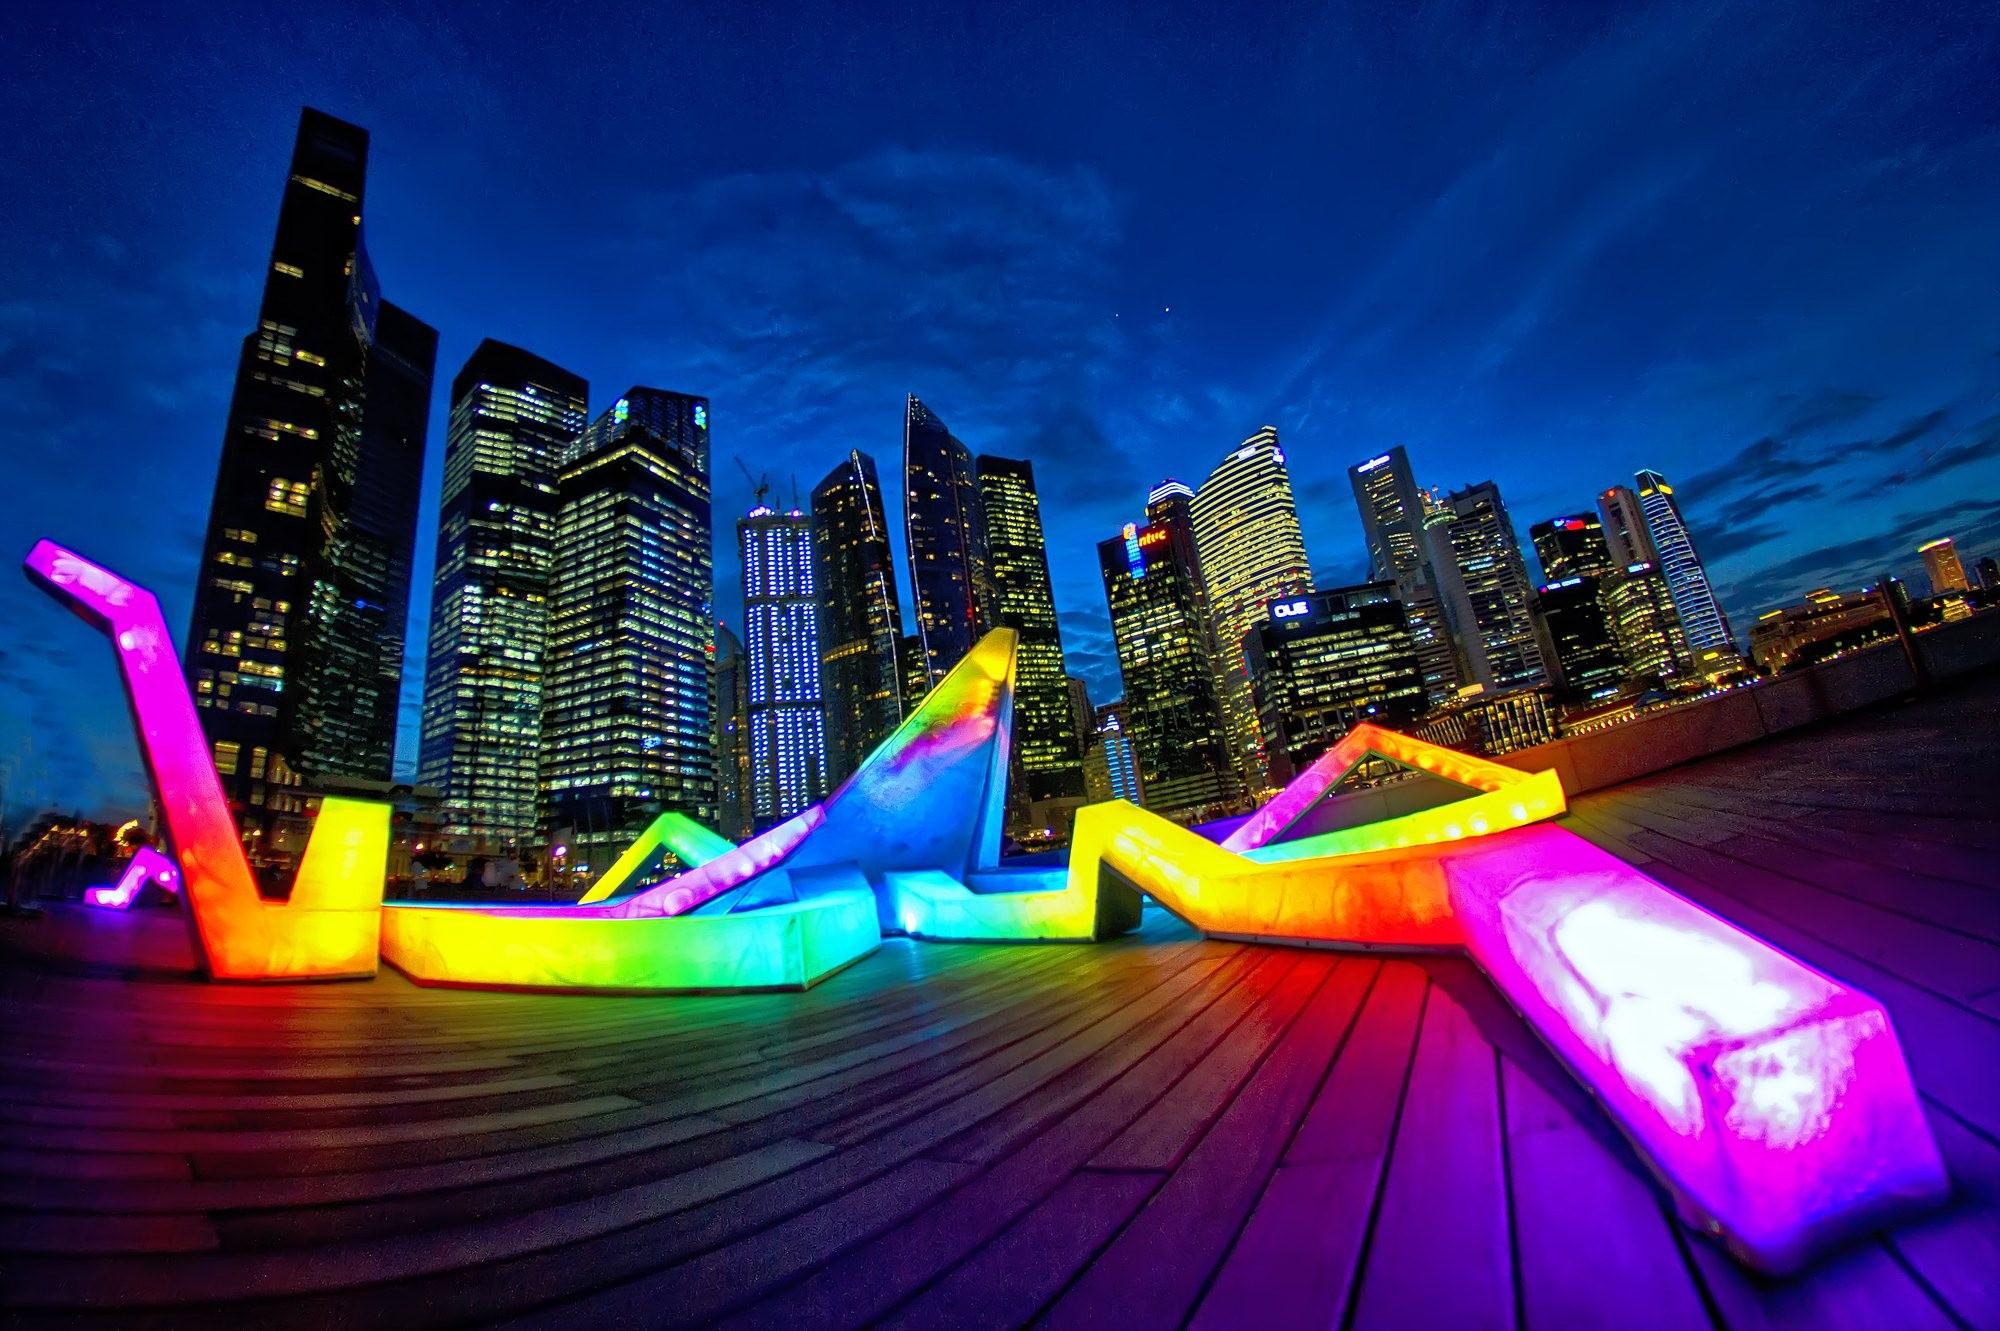 Light Matters: Europe's Leading Light Festivals, Light Marina Bay. Singapore, 2012. Image © Darren Chin